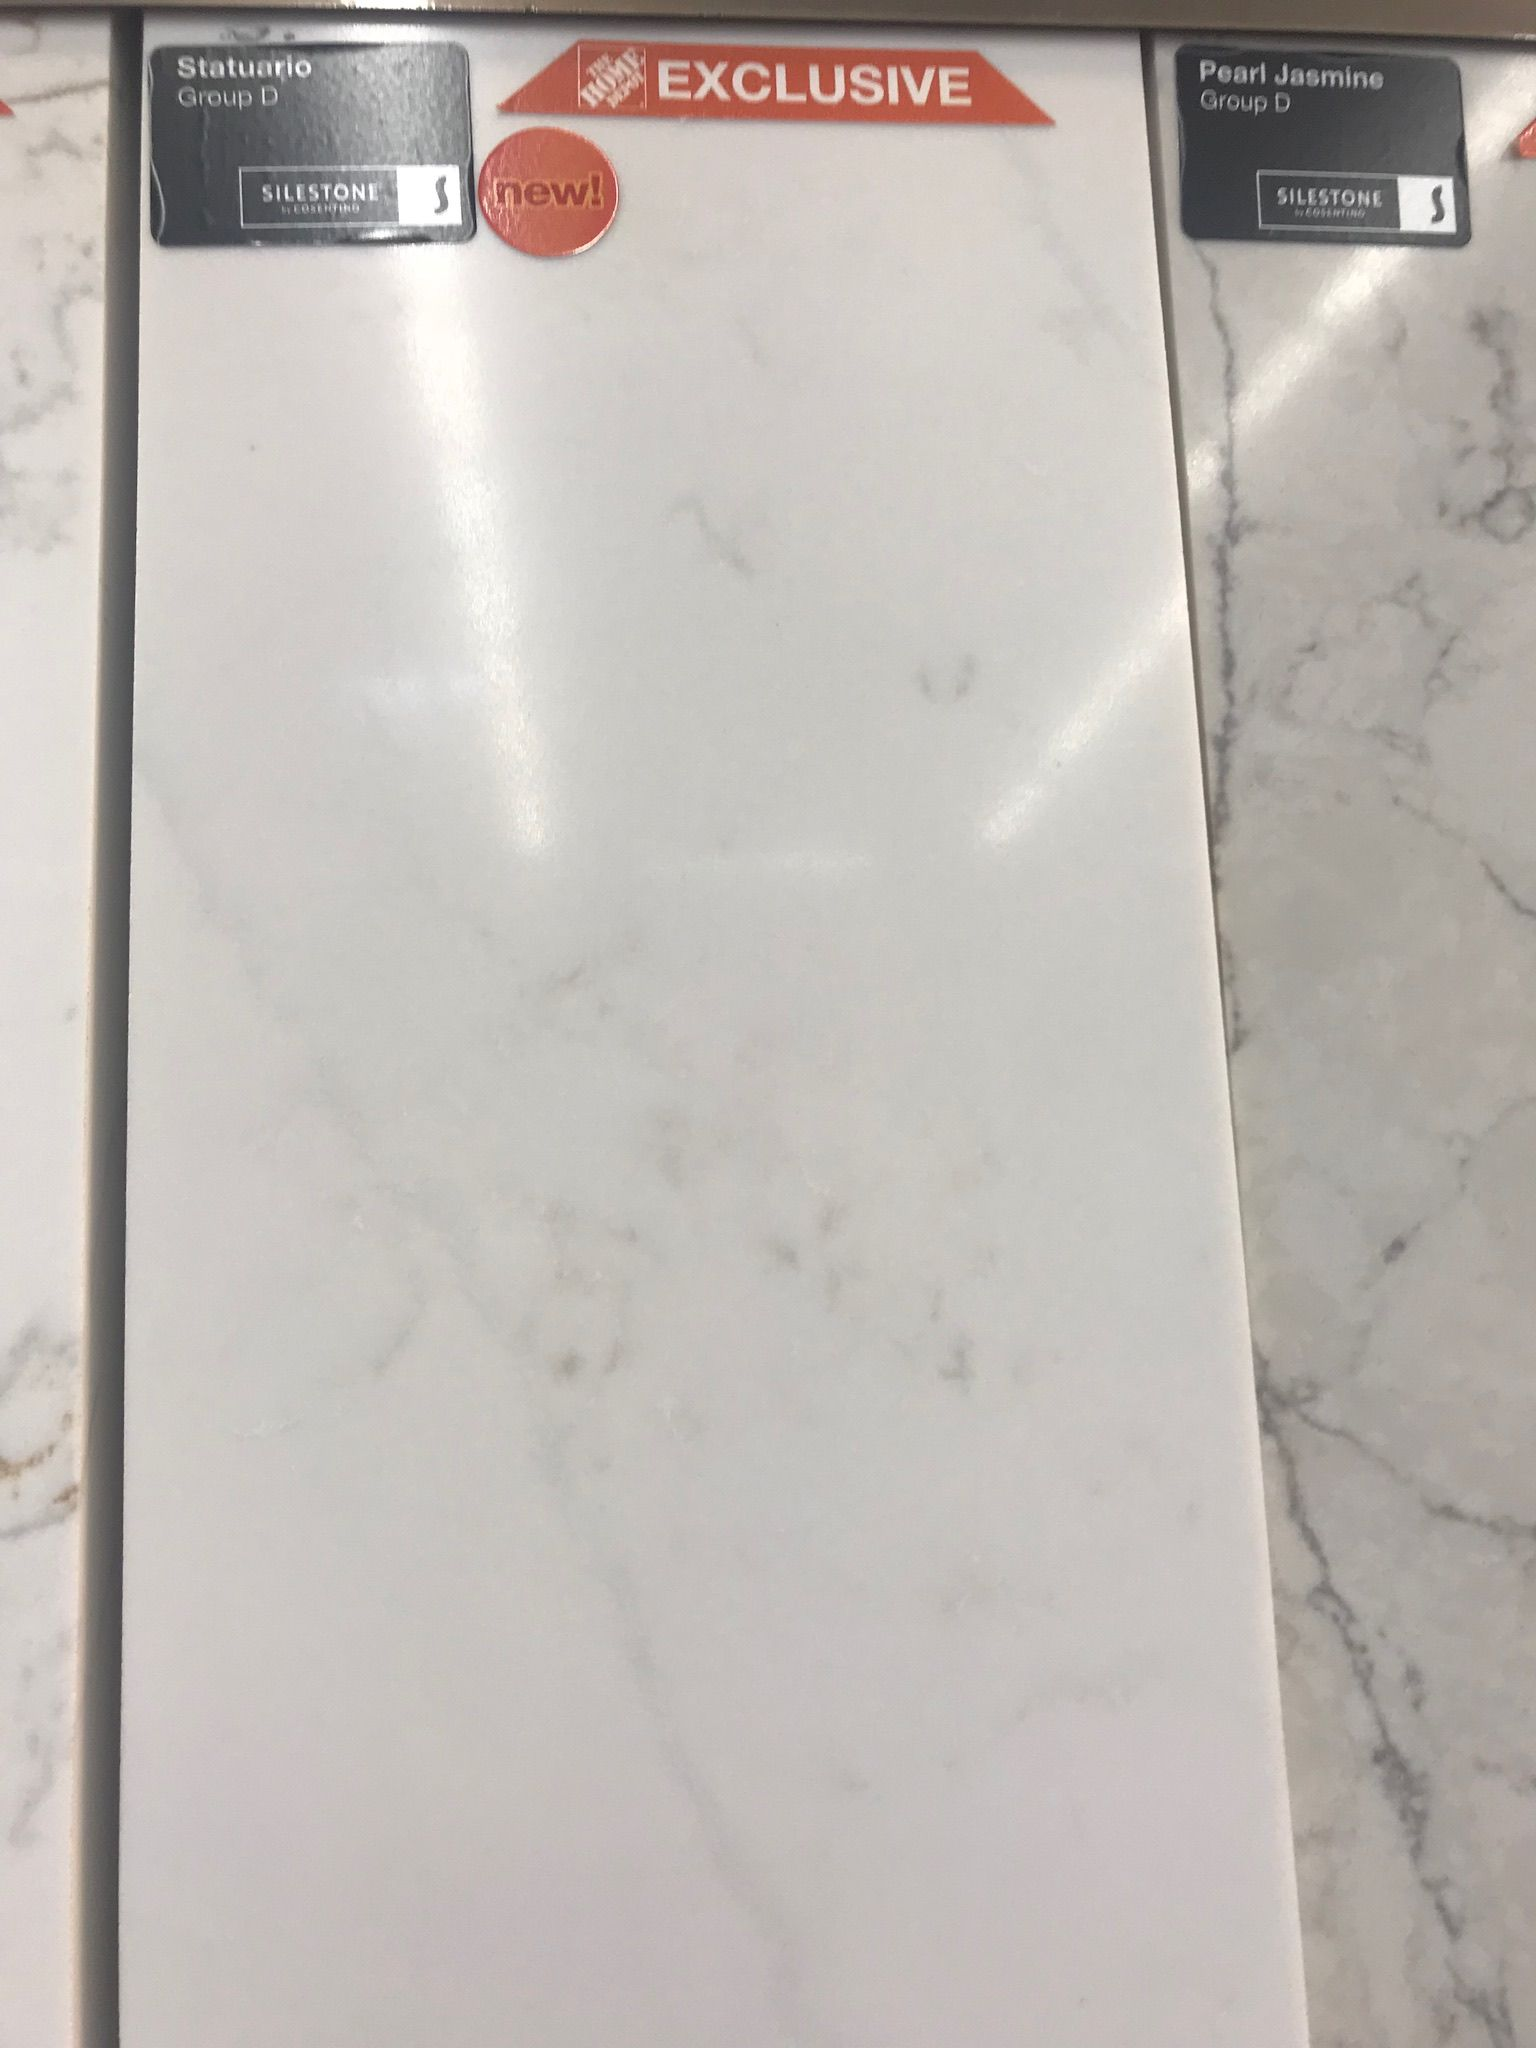 Silestone Statuario Sample Silestone Countertops Recycled Glass